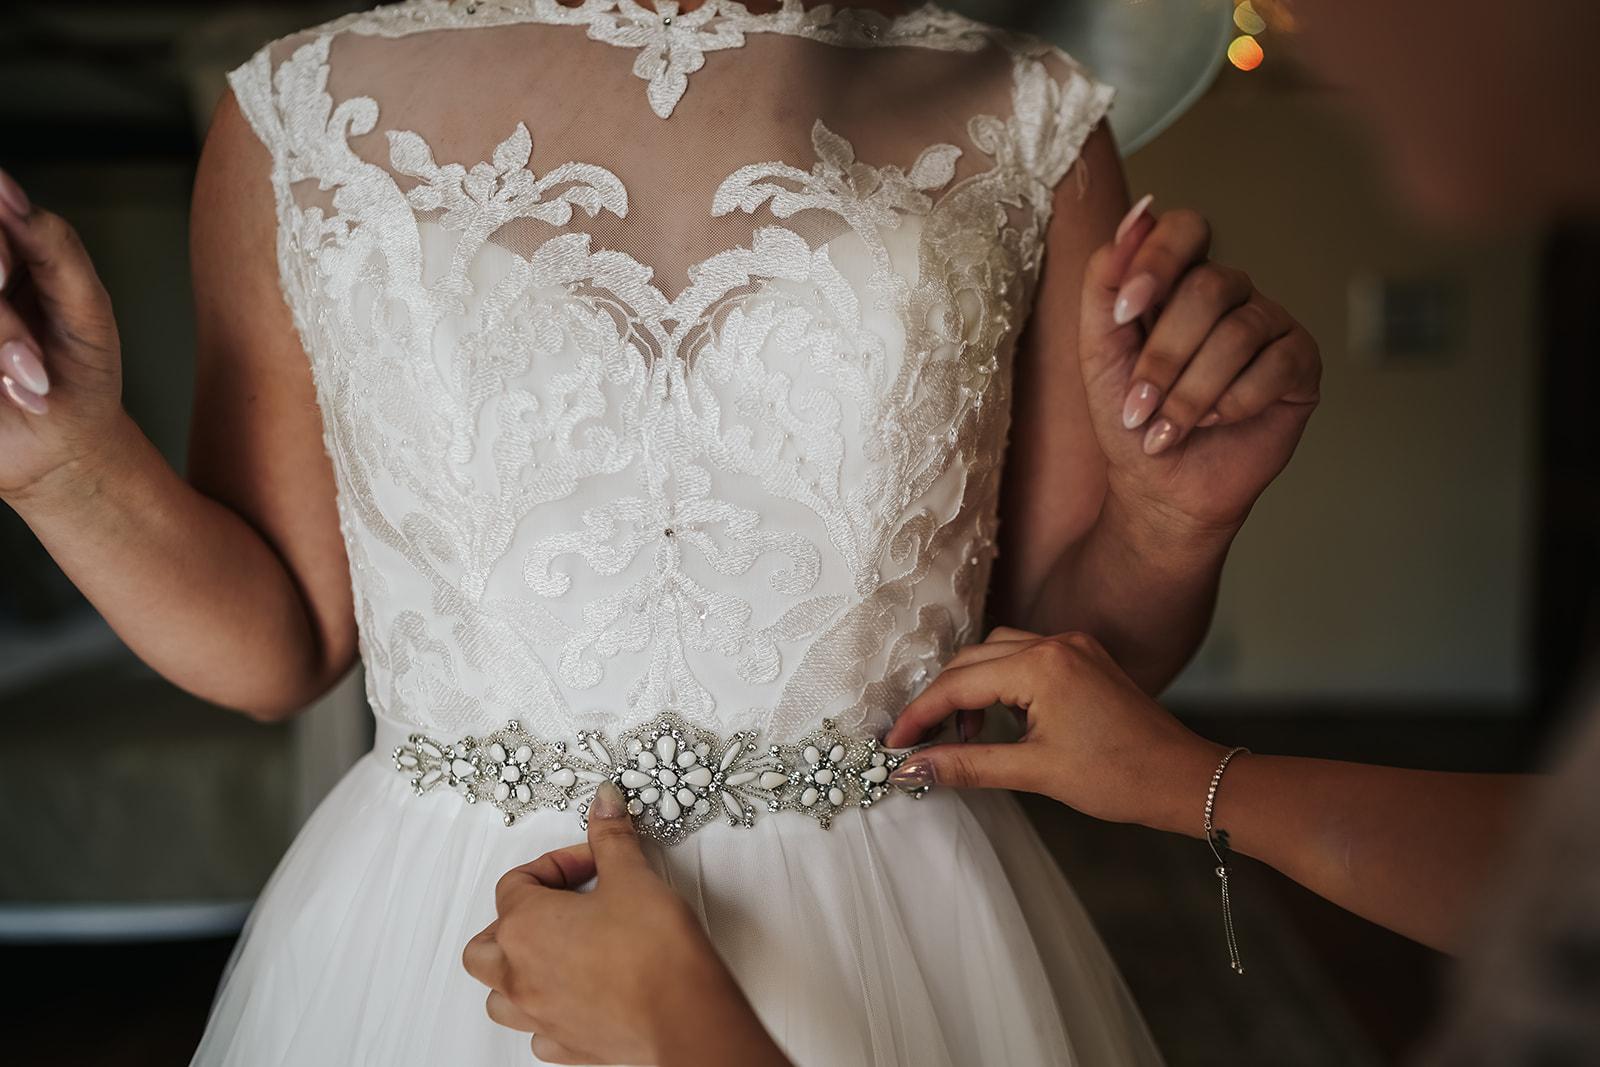 Bridal belt in bridal suite at West Tower